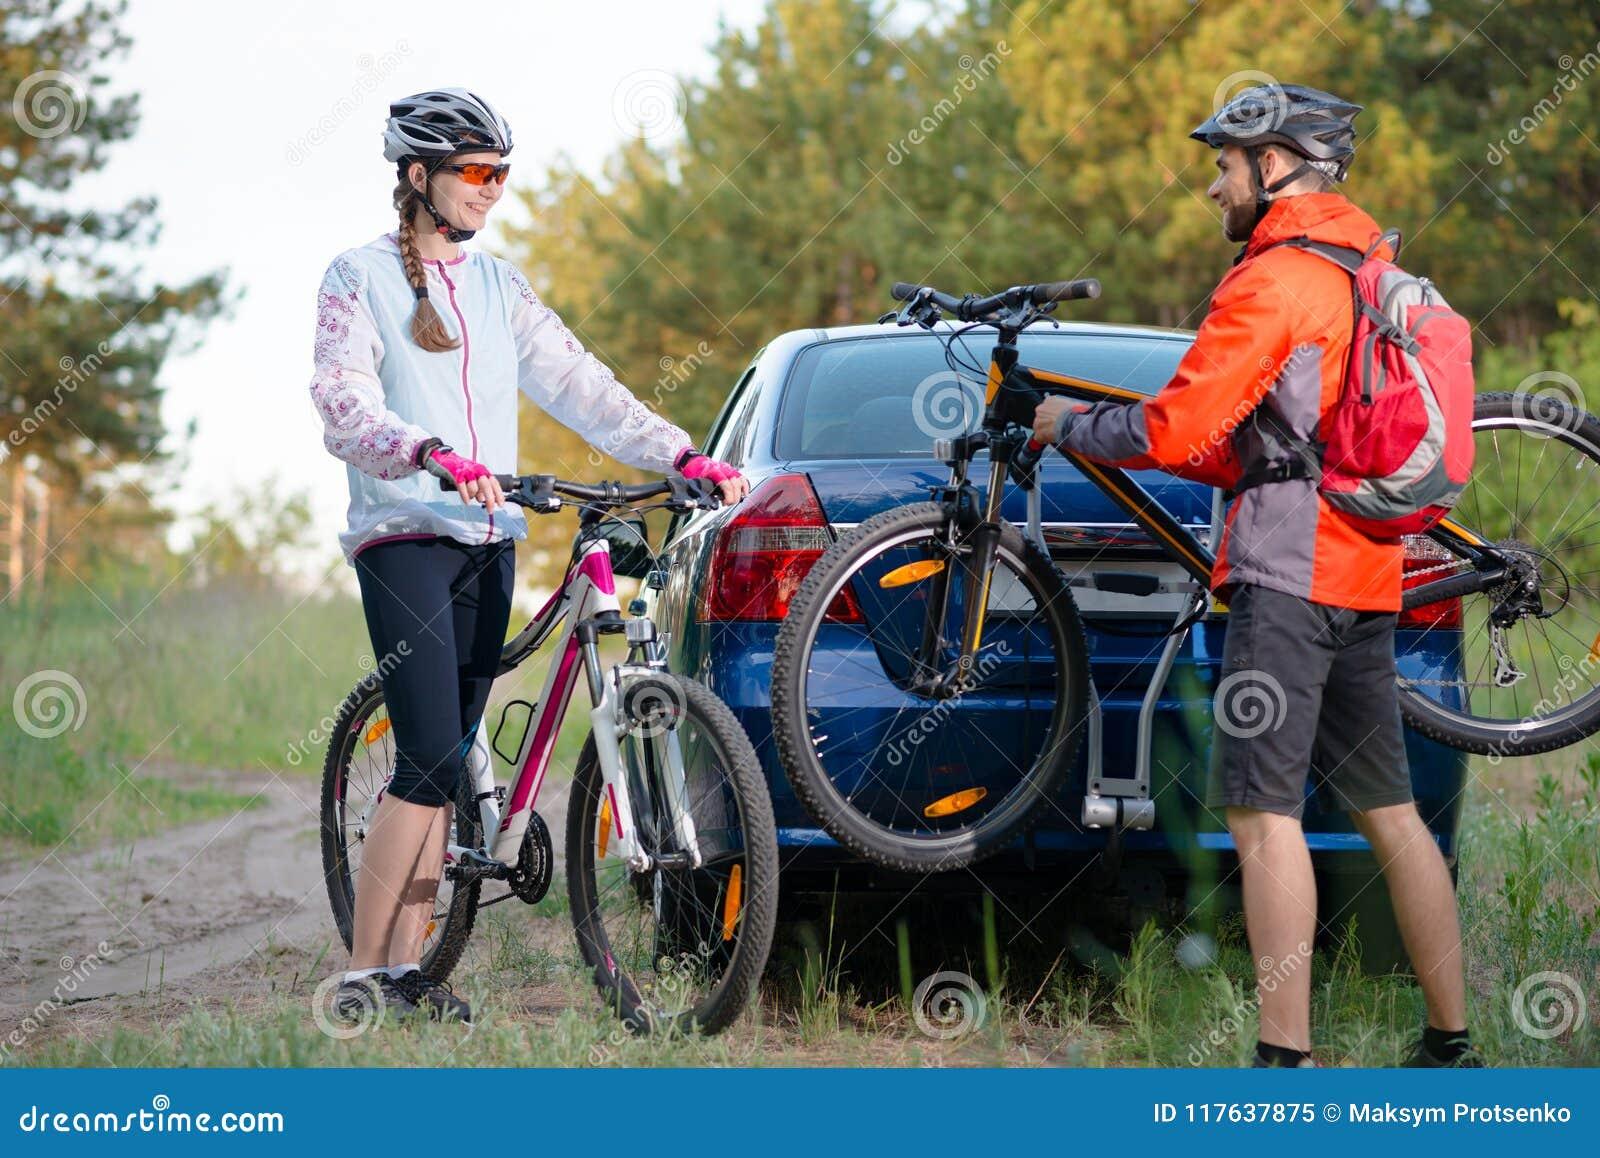 Mountain bike novos de Unmounting dos pares da cremalheira da bicicleta no carro Conceito do curso da aventura e da família